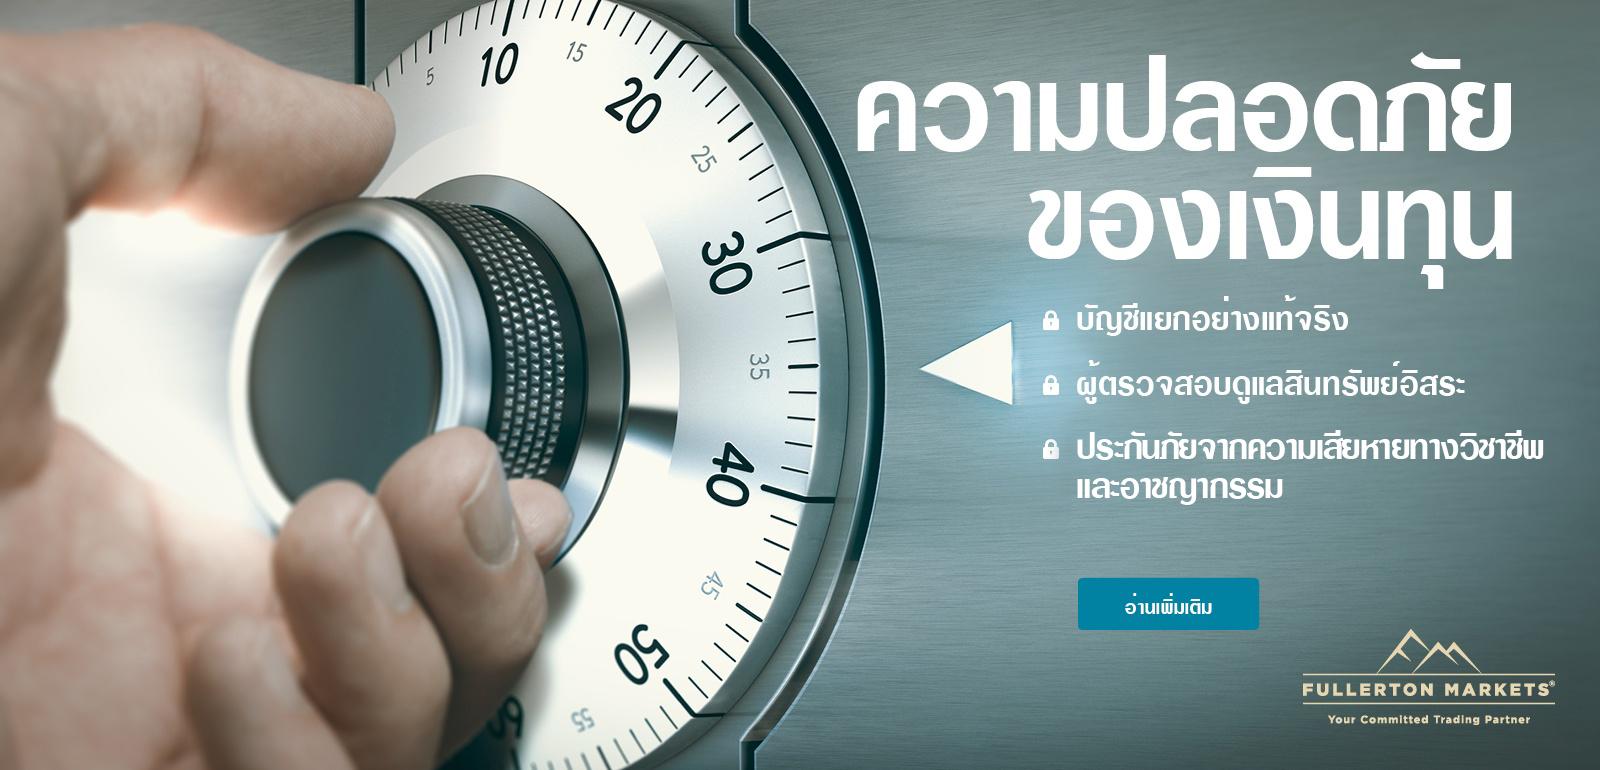 180731-FM-WebHomePageBanner-FundSafety-TH-w1600x770px